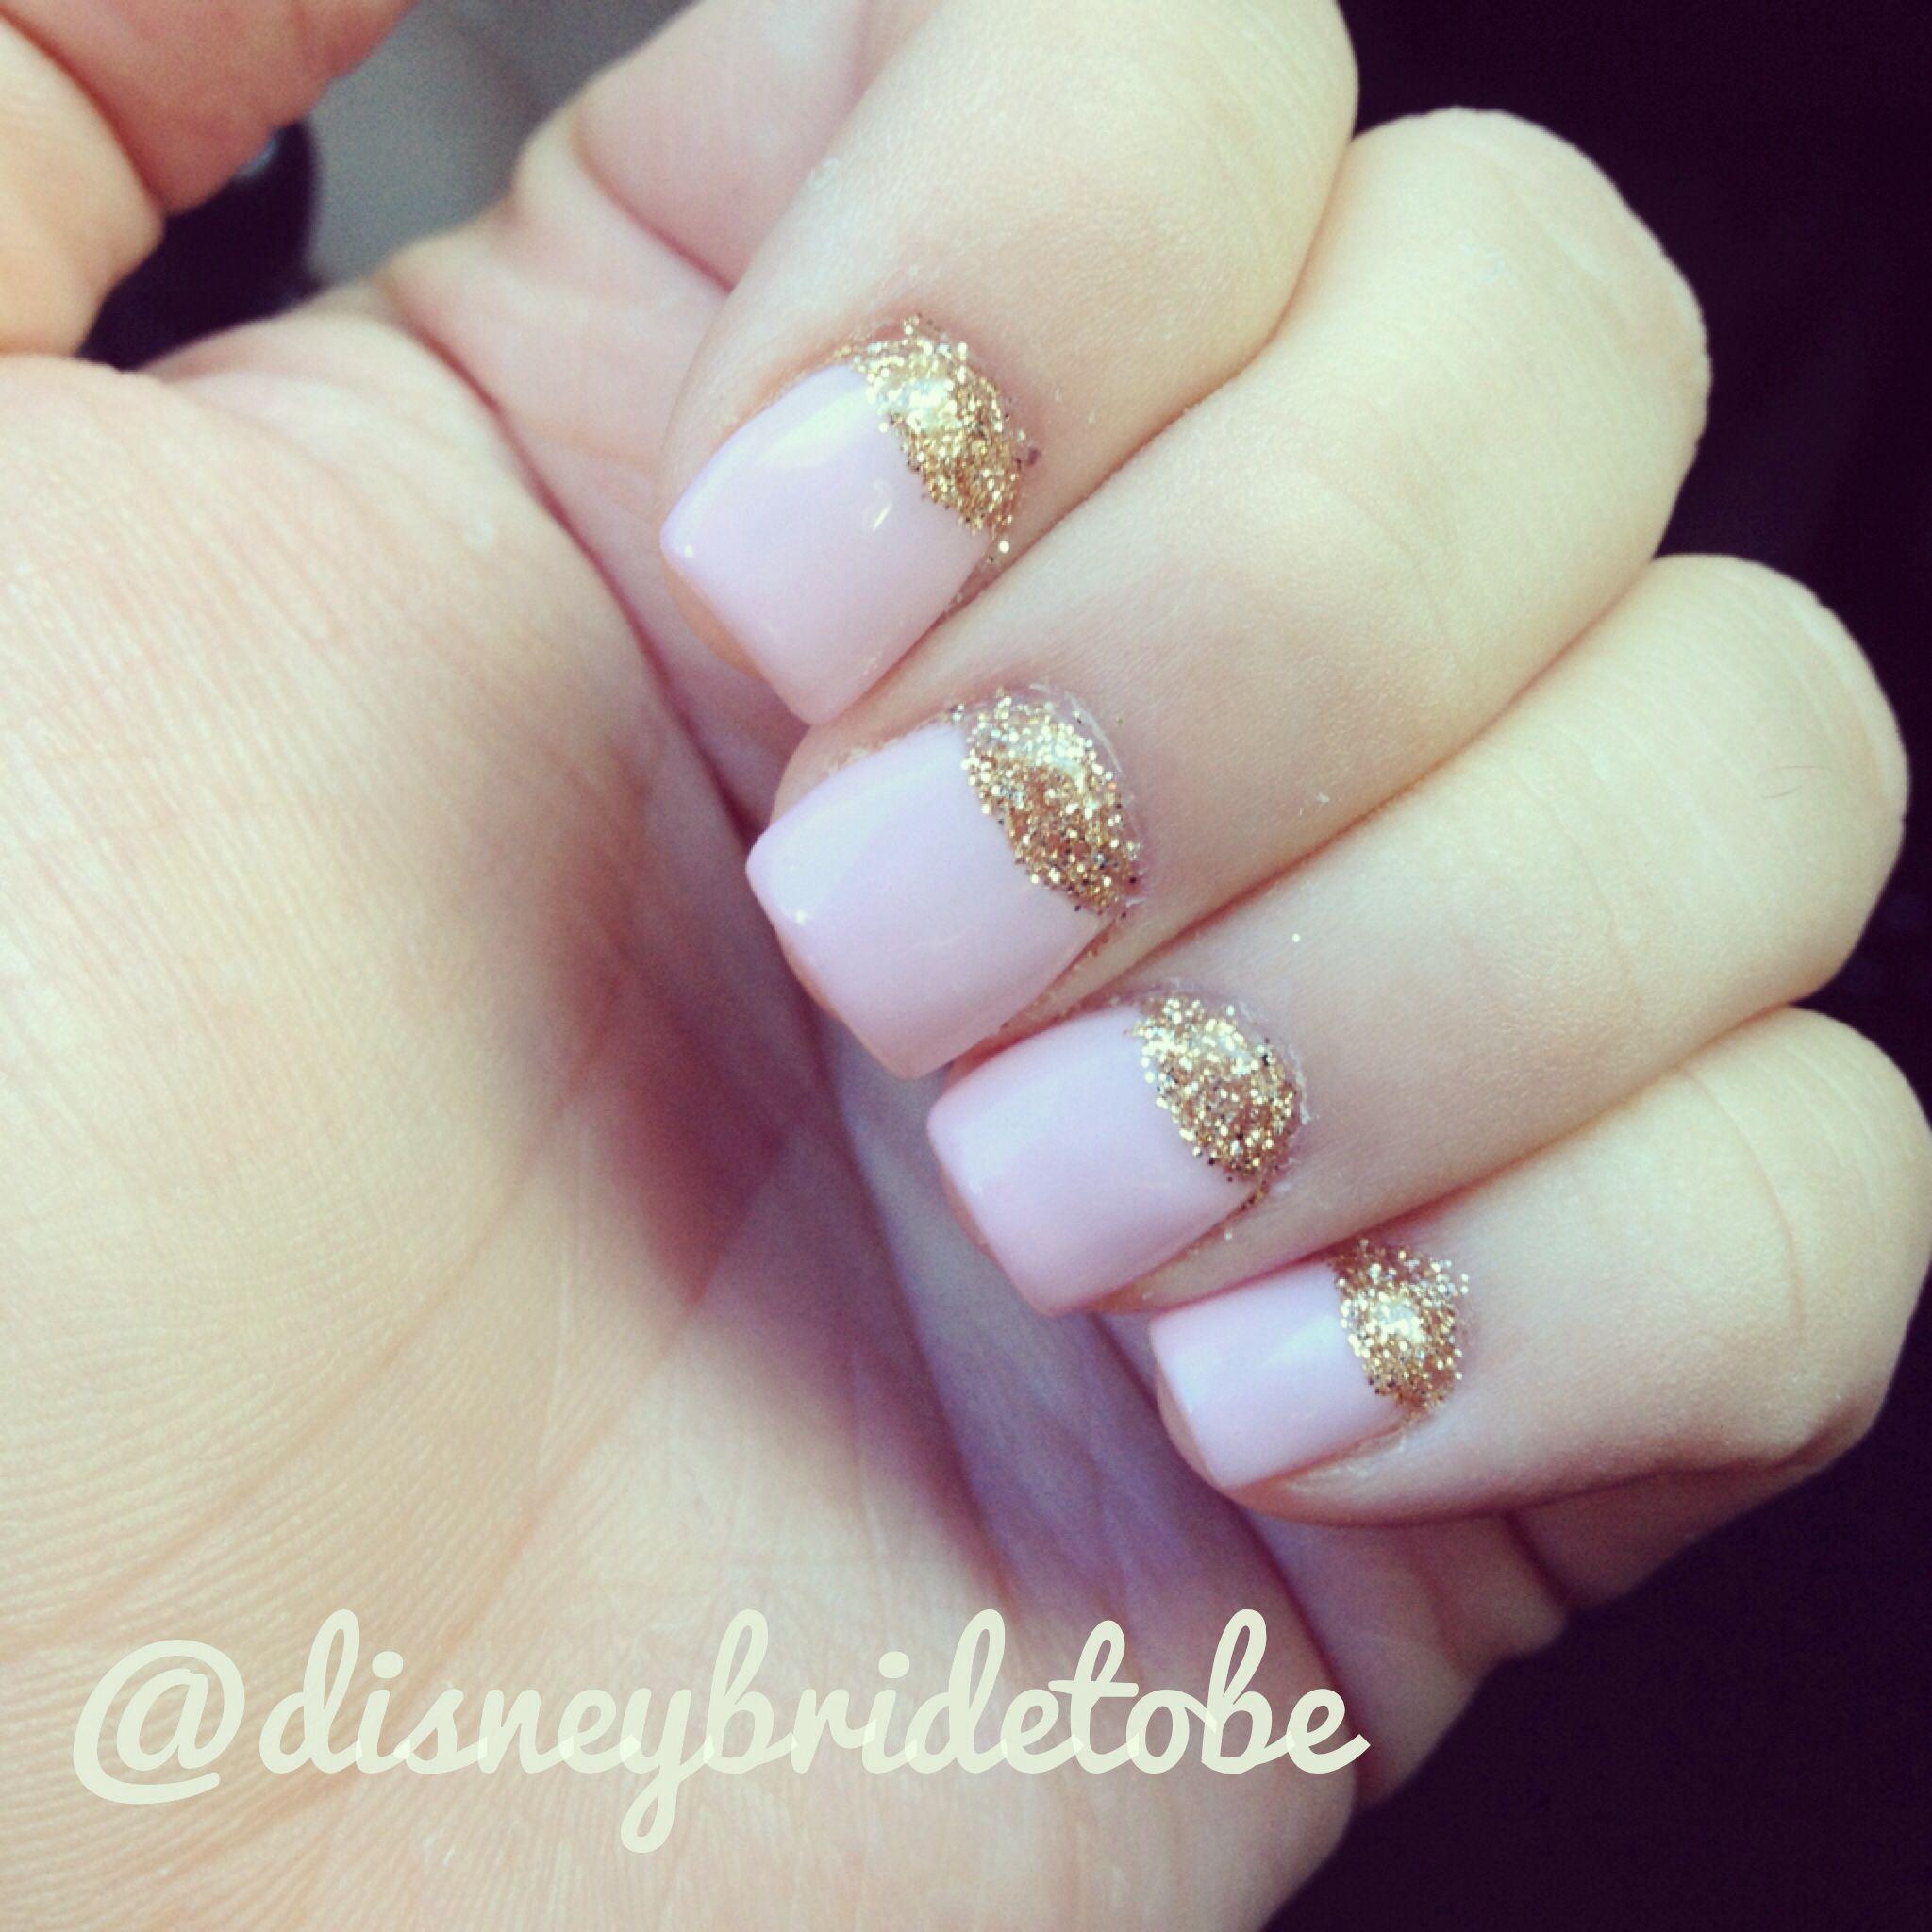 Sleeping Beauty Nail Art: Sleeping Beauty Nails!! Follow Disneybridetobe On